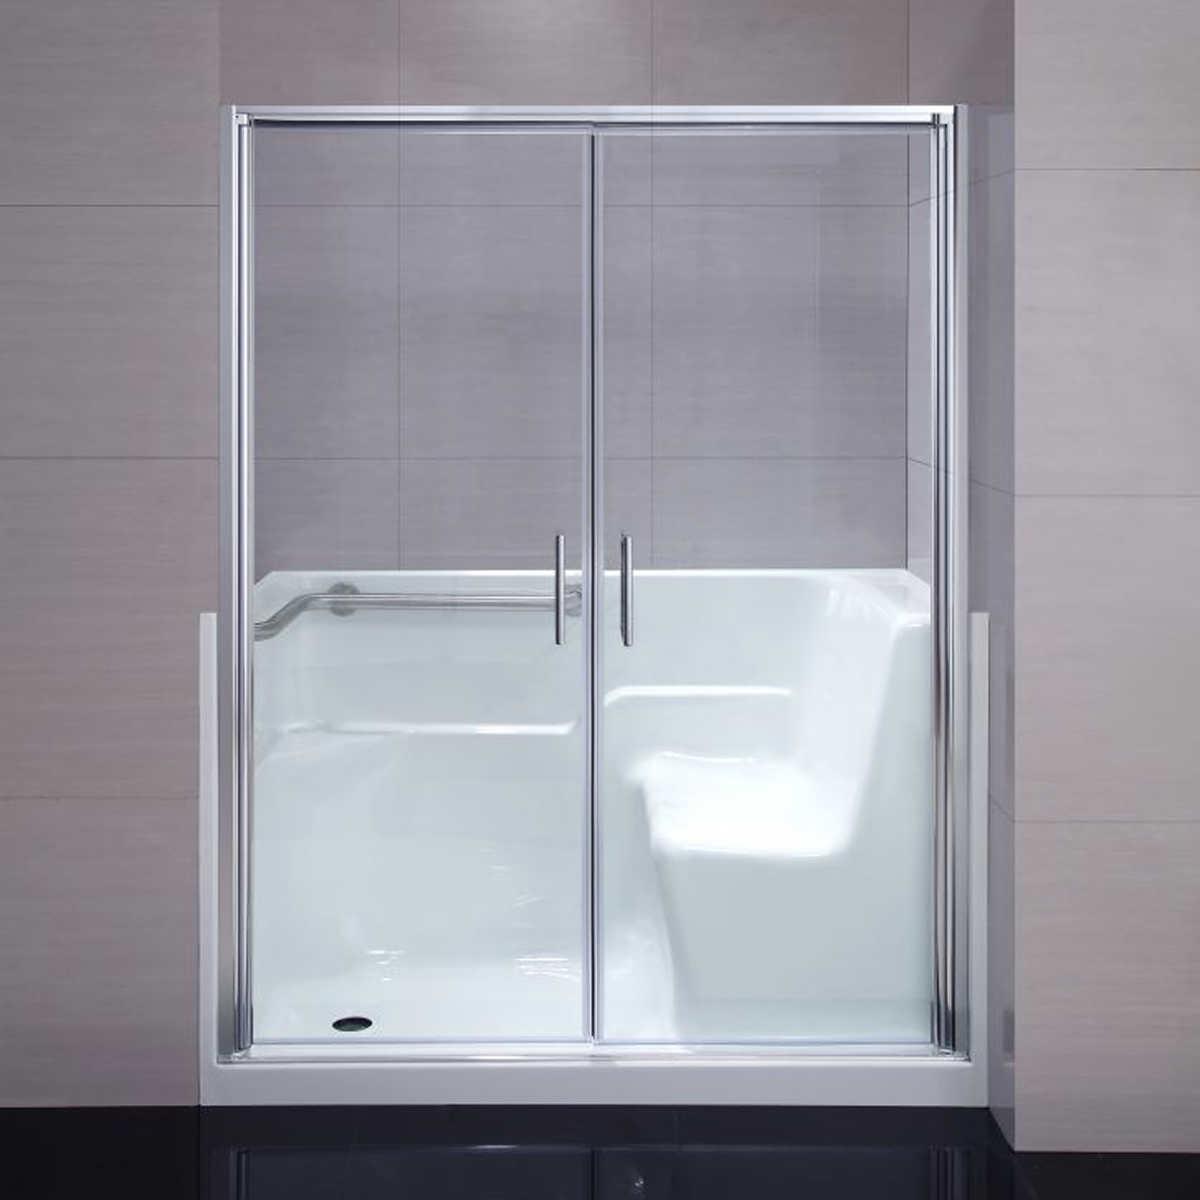 Handicapped bathroom showers